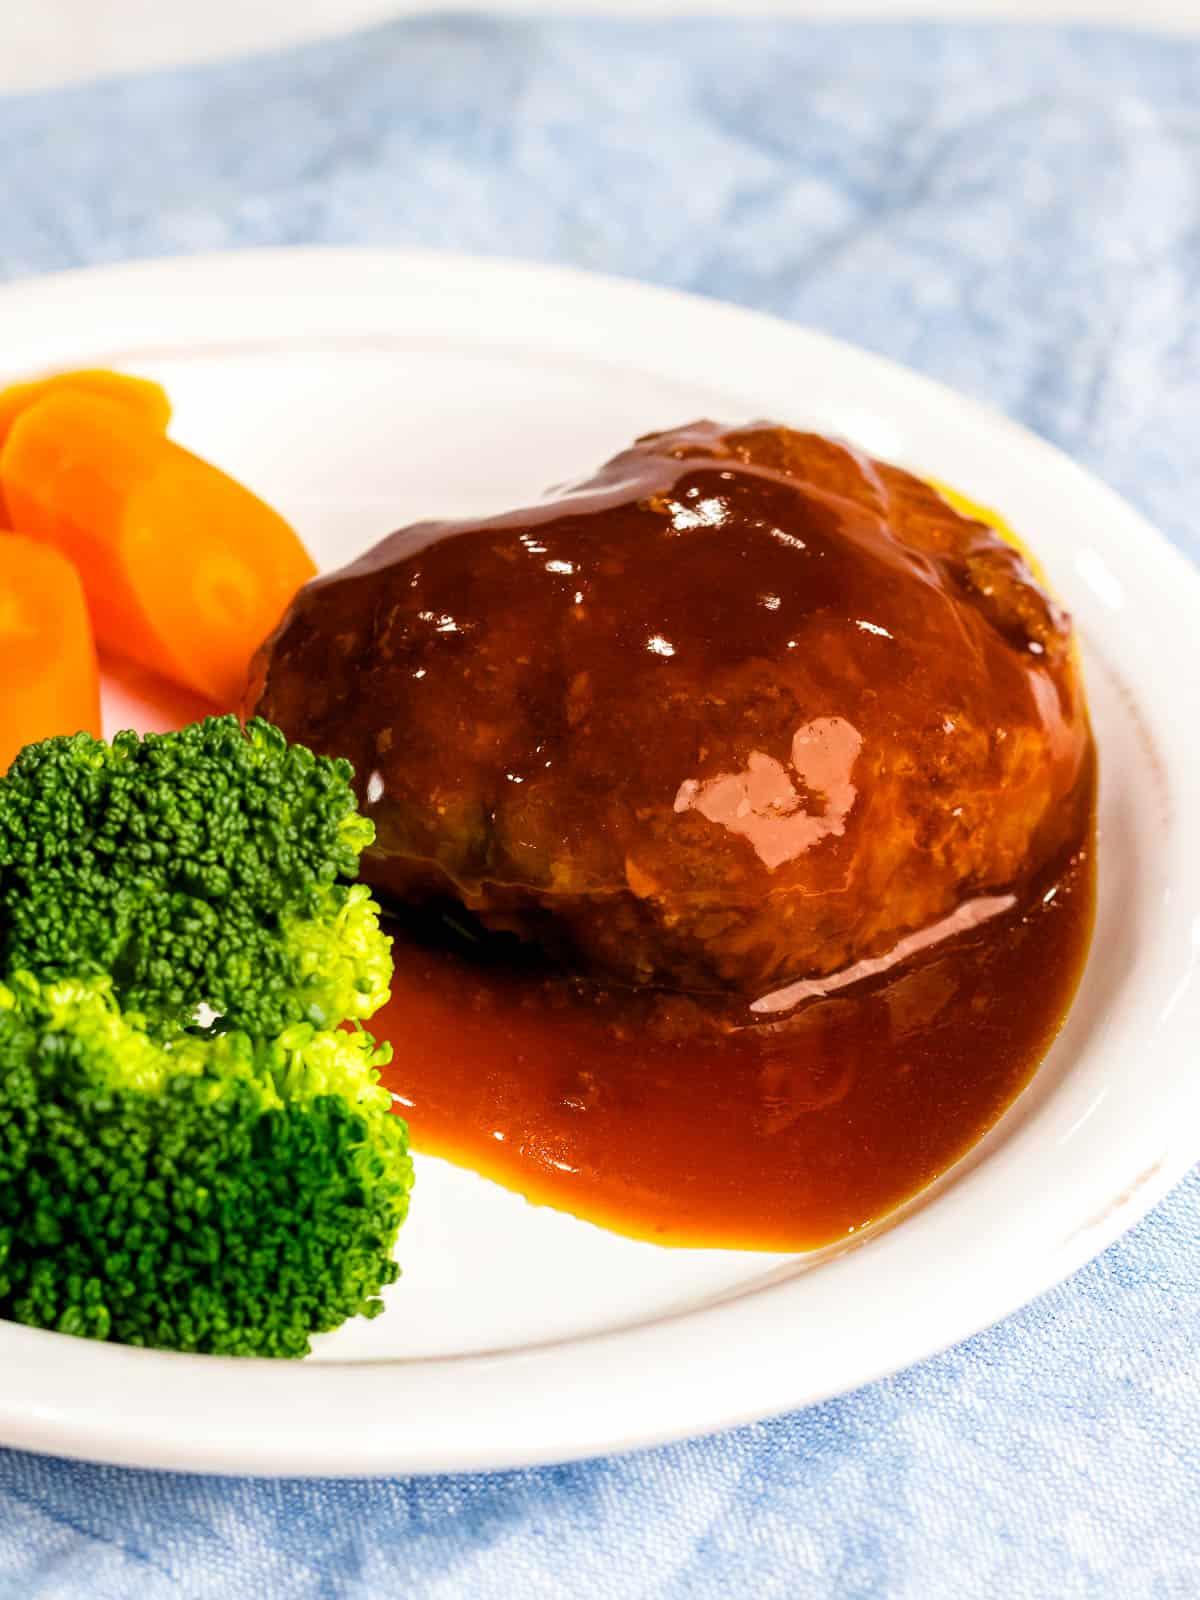 Juicy Japanese hamburger steak (hambāgu ハンバーグ) covered in sauce on a white plate next to carrots and broccoli.